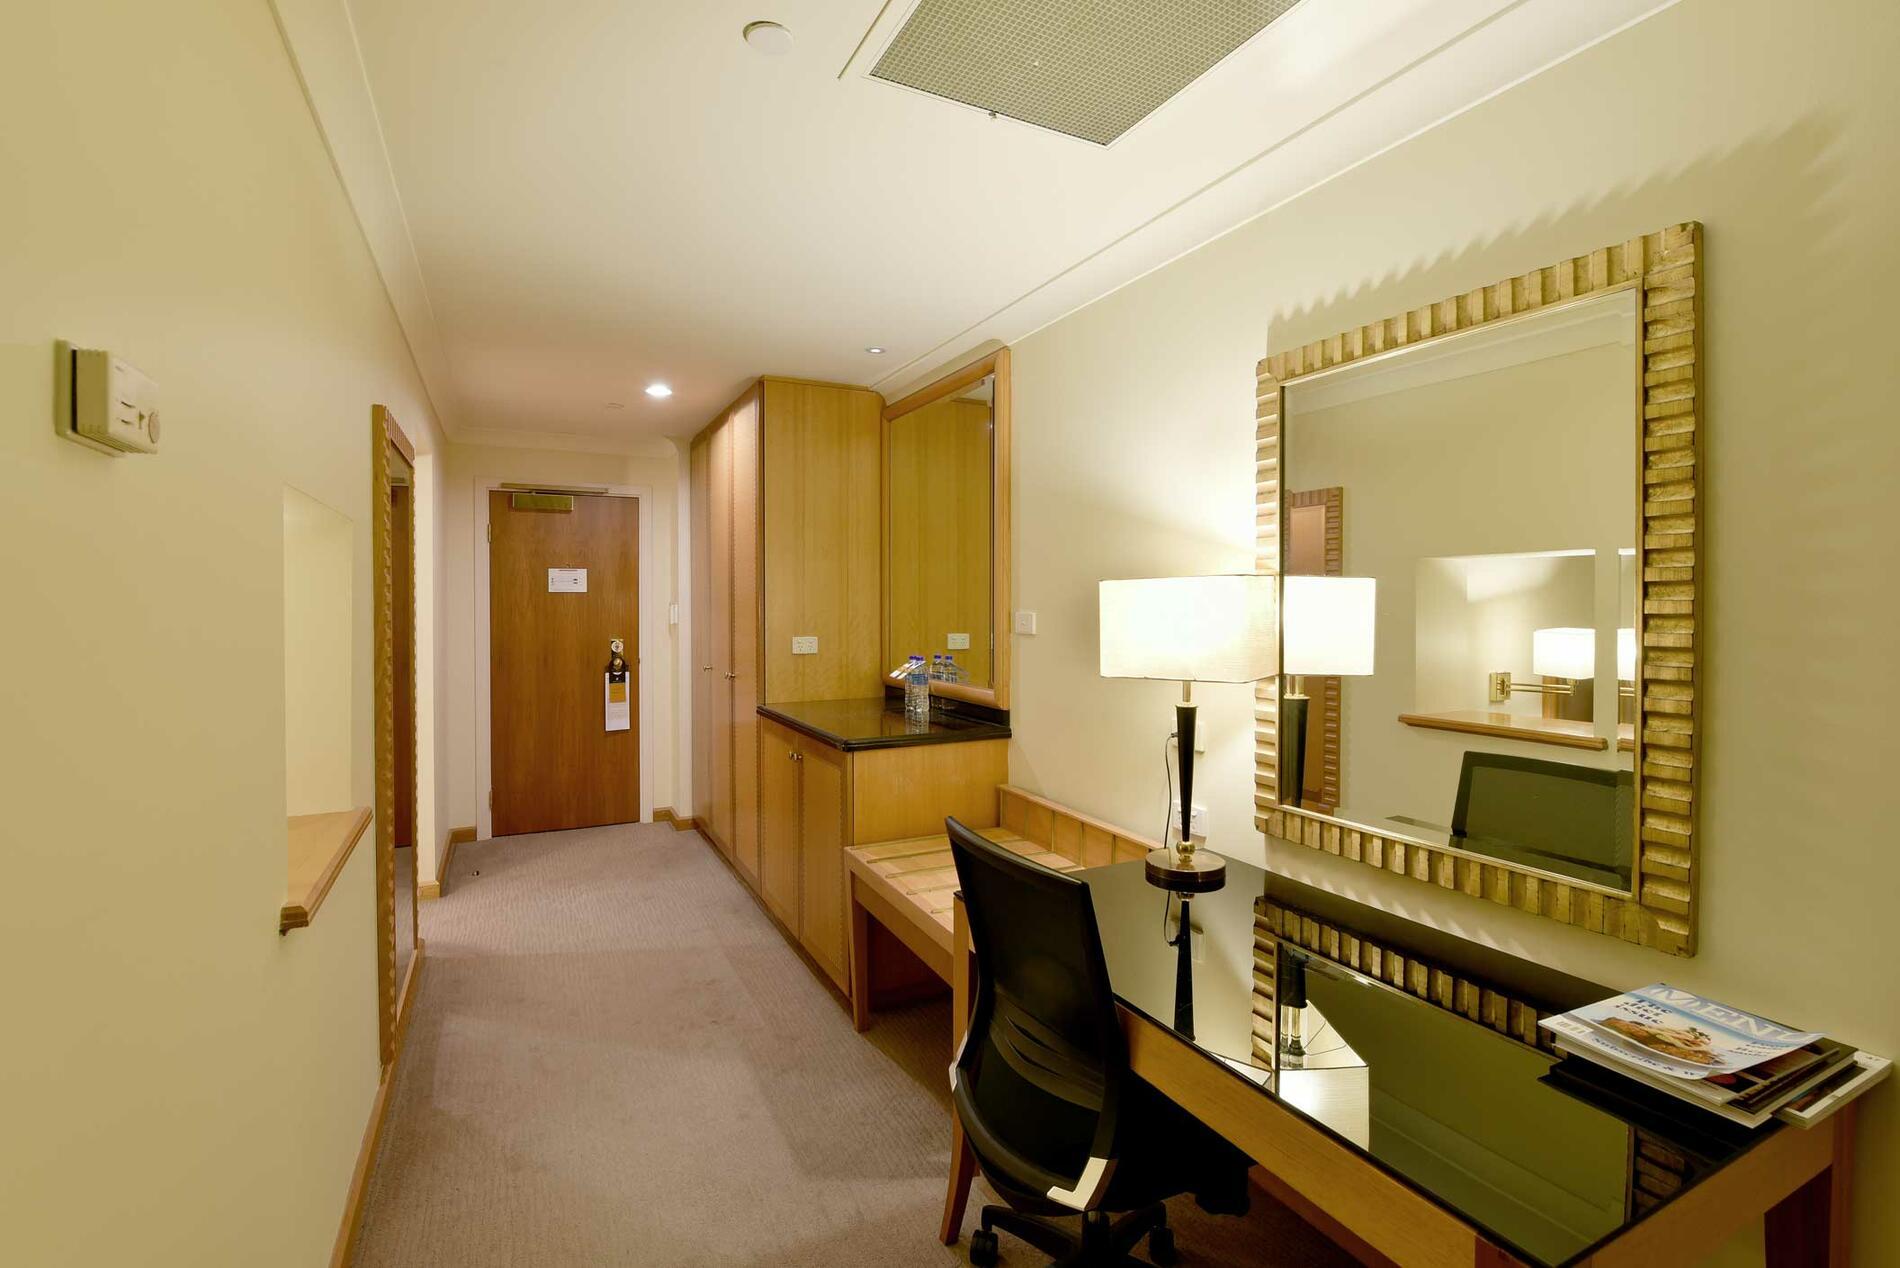 Luxury Hotel Rooms | Duxton Hotel Perth | Perth CBD Hotels